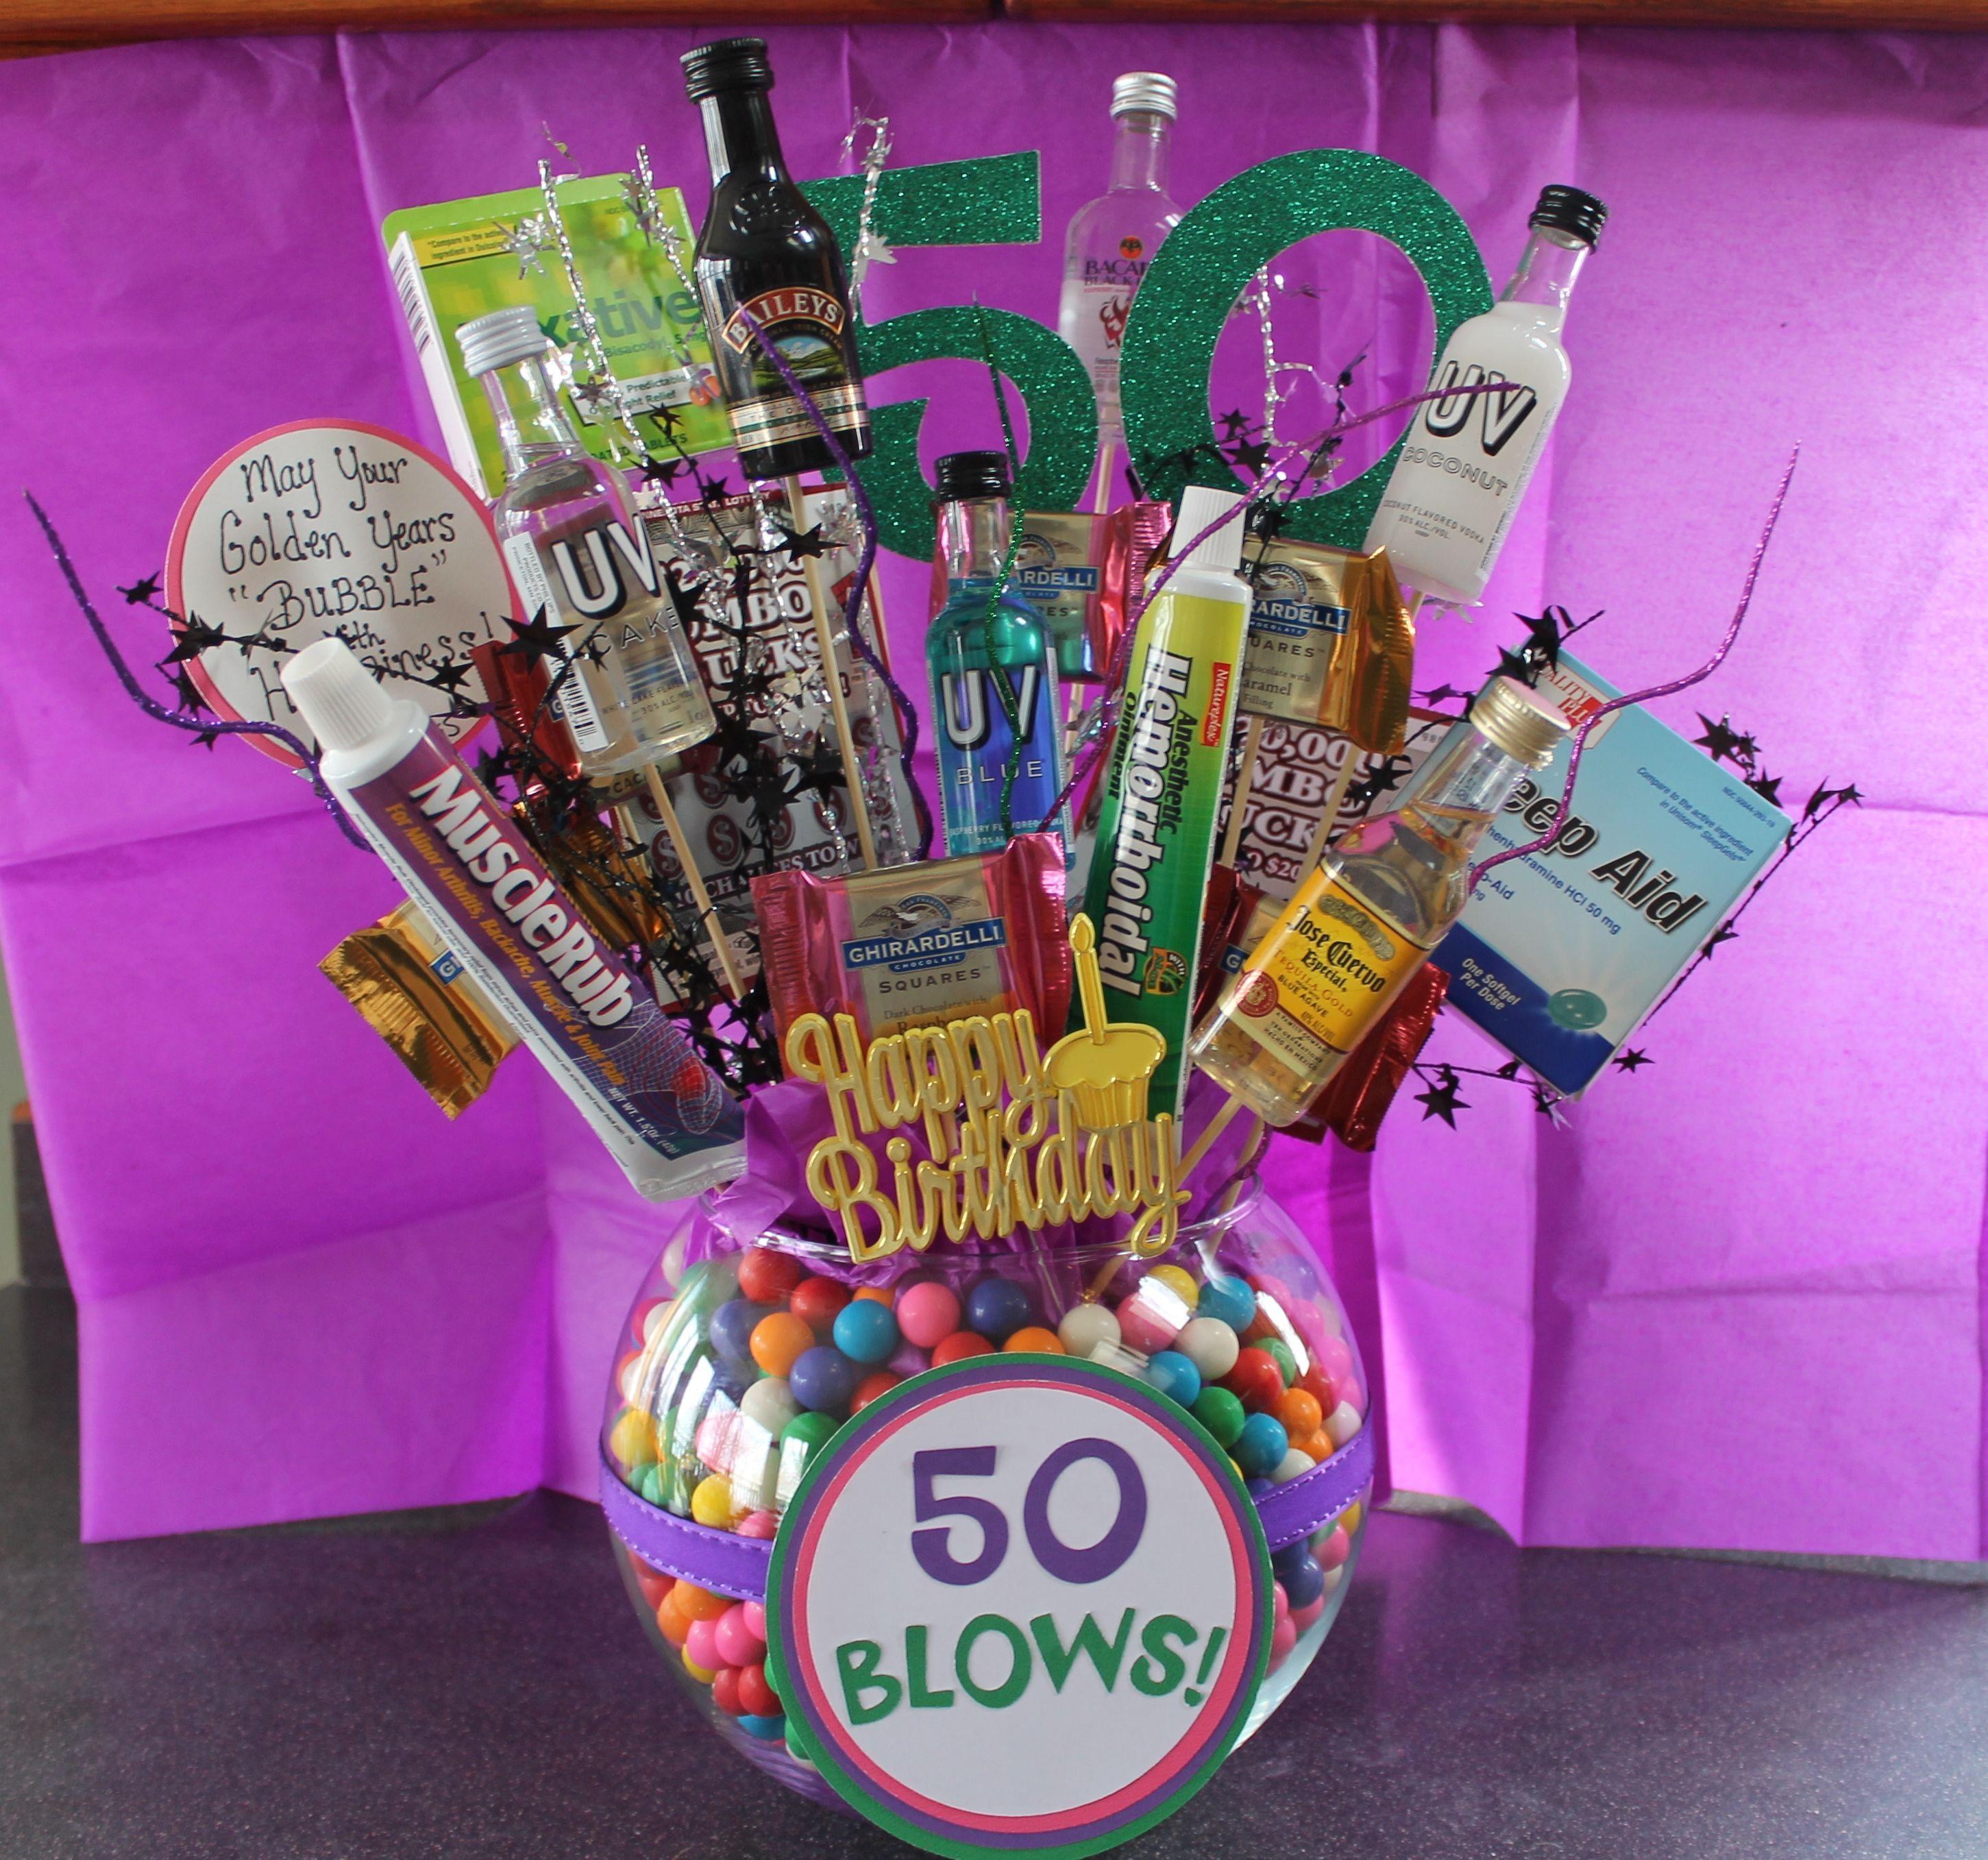 50th birthday gift ideas diy crafty projects in 2020